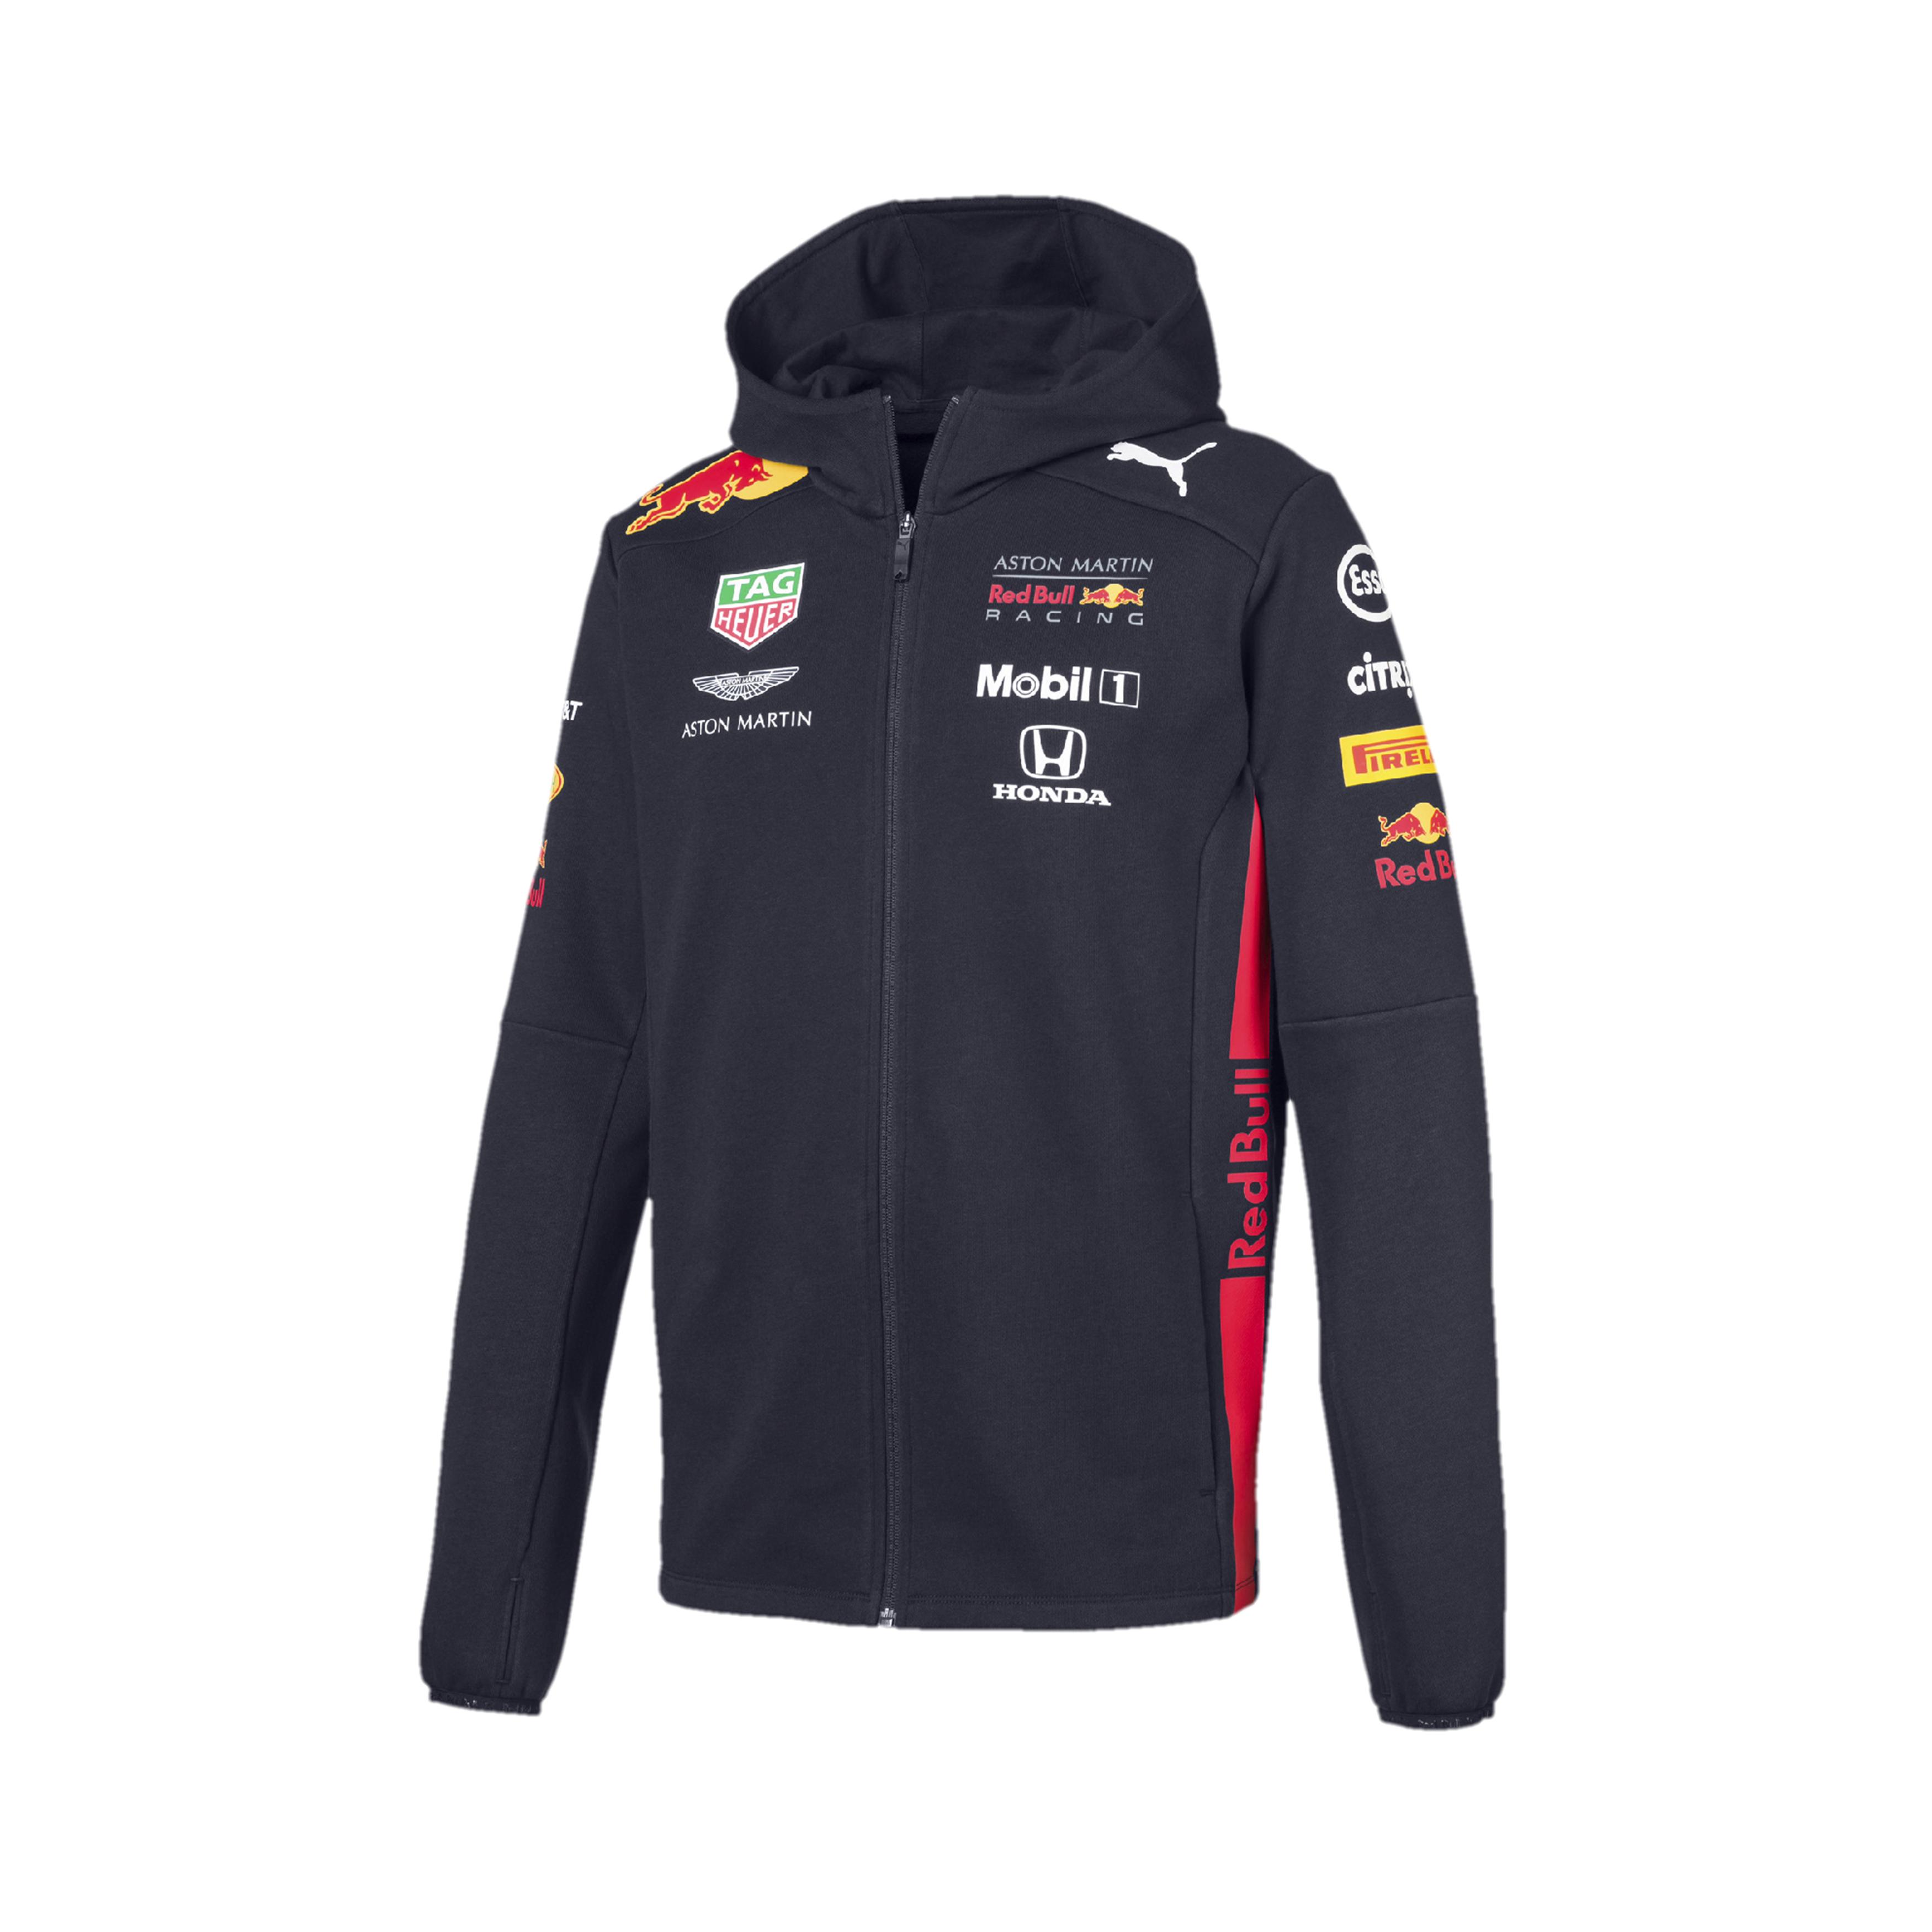 NOUVEAU! 2019 Red Bull Racing F1 Formule